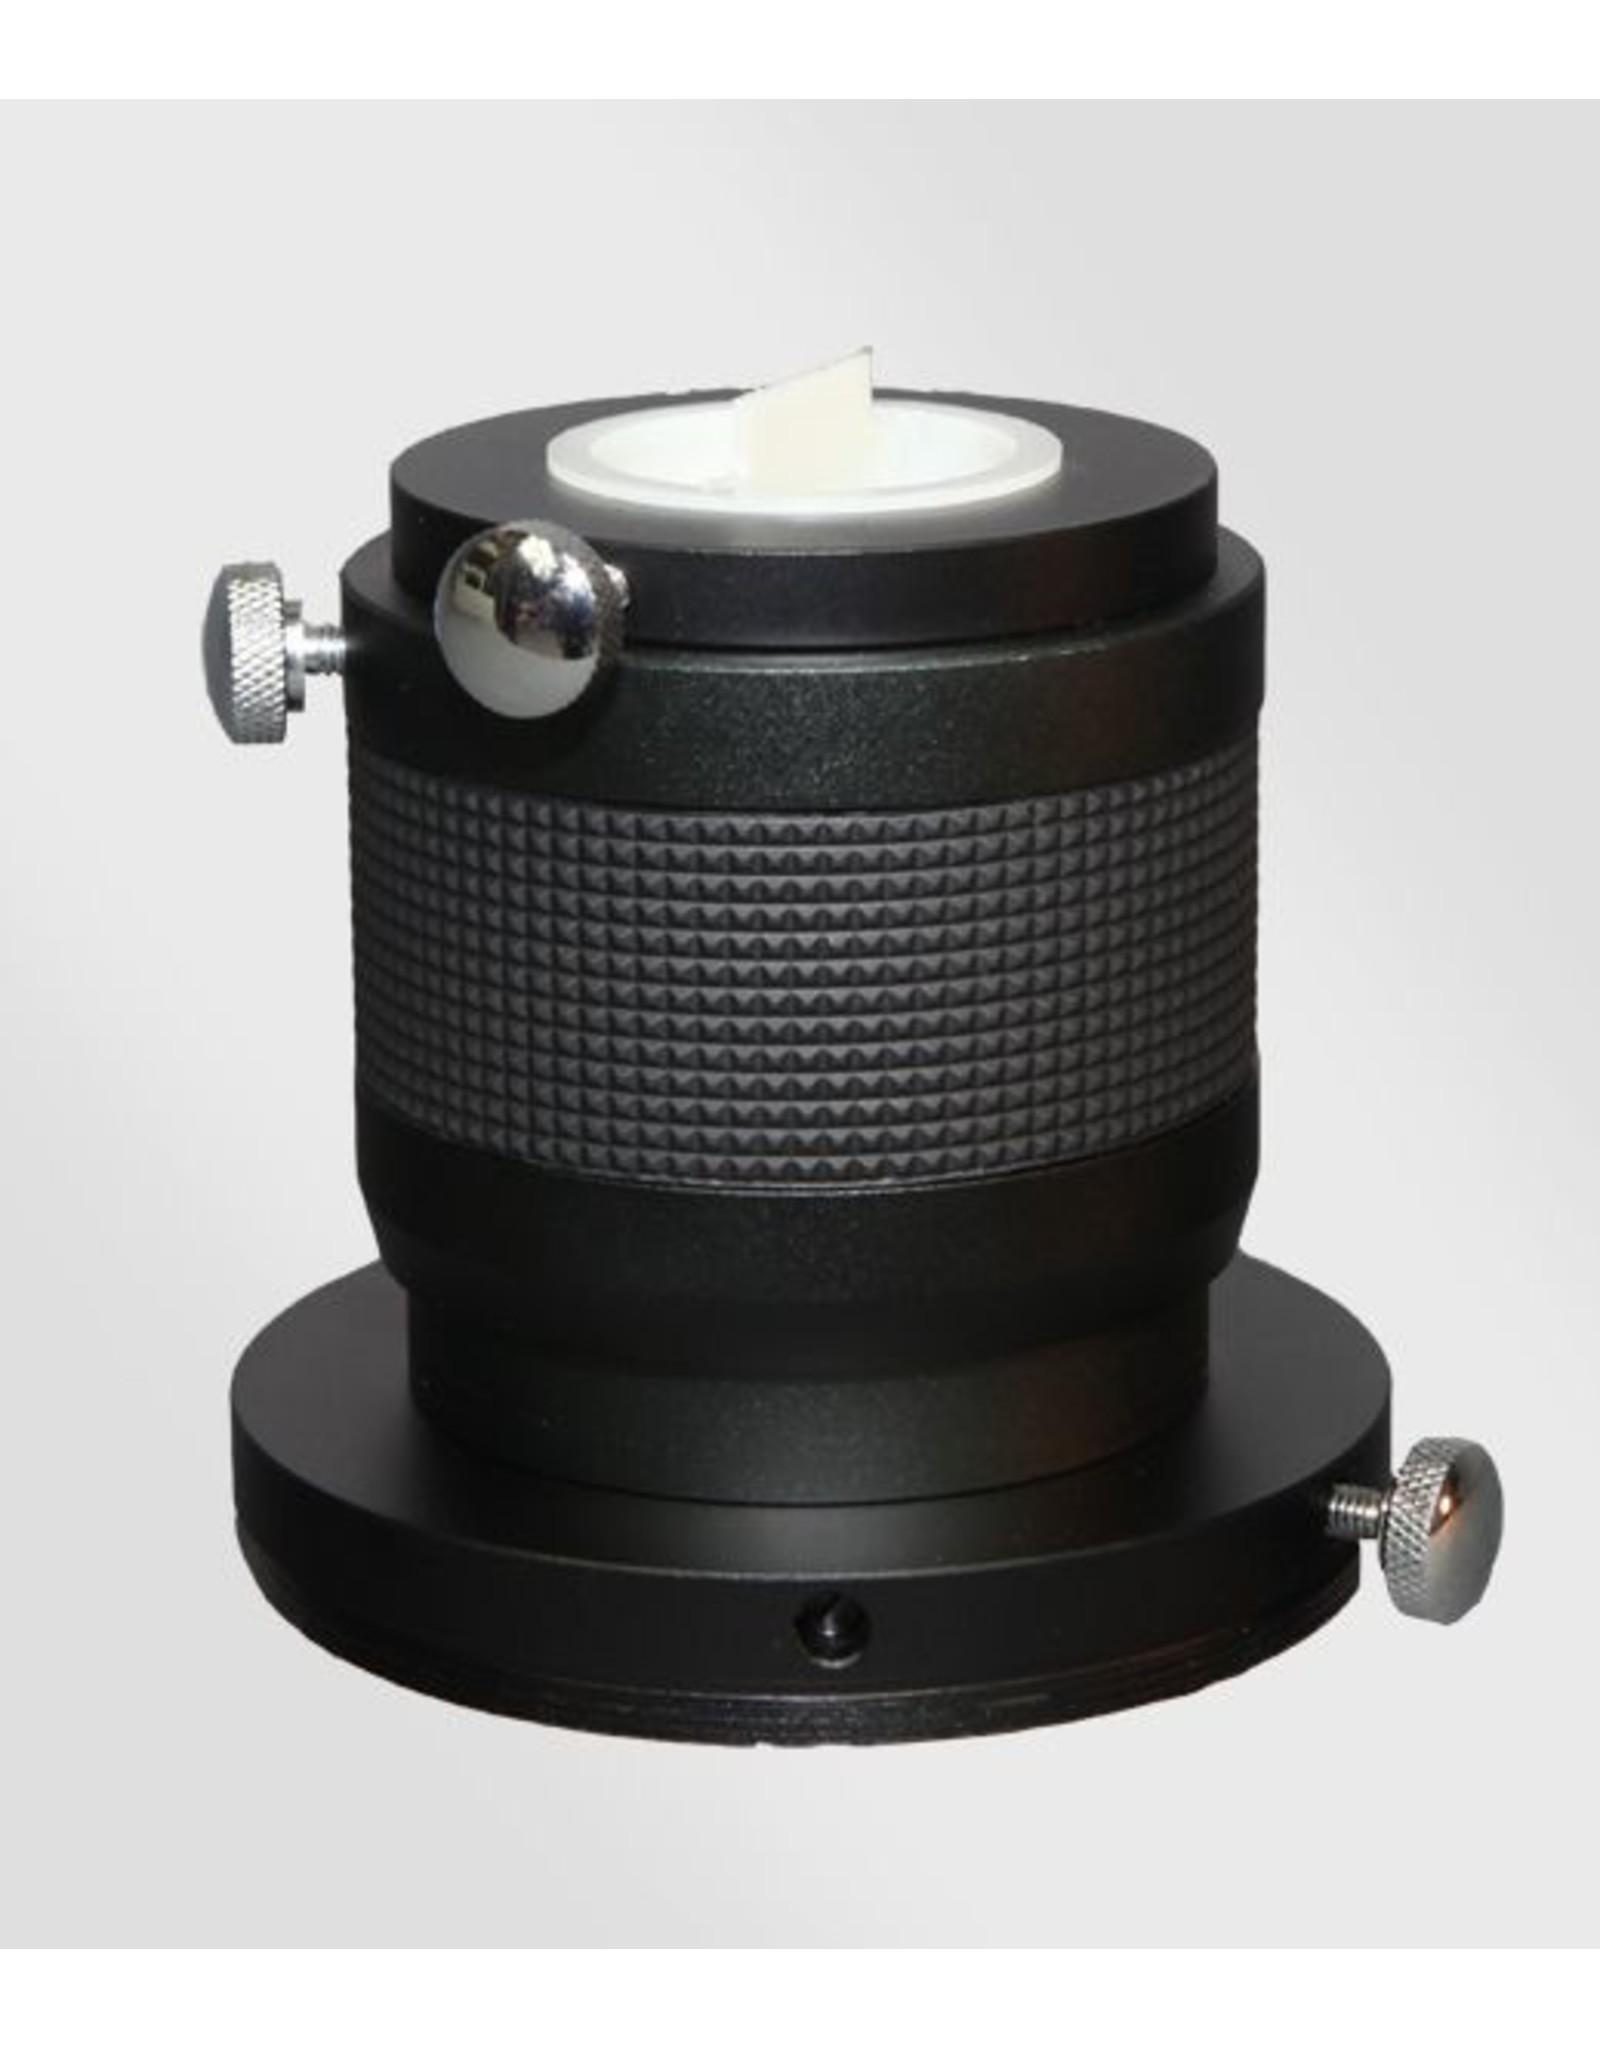 Stellarvue Stellarvue 2 inch Helical Focuser - For 80mm Finderscopes - F080H